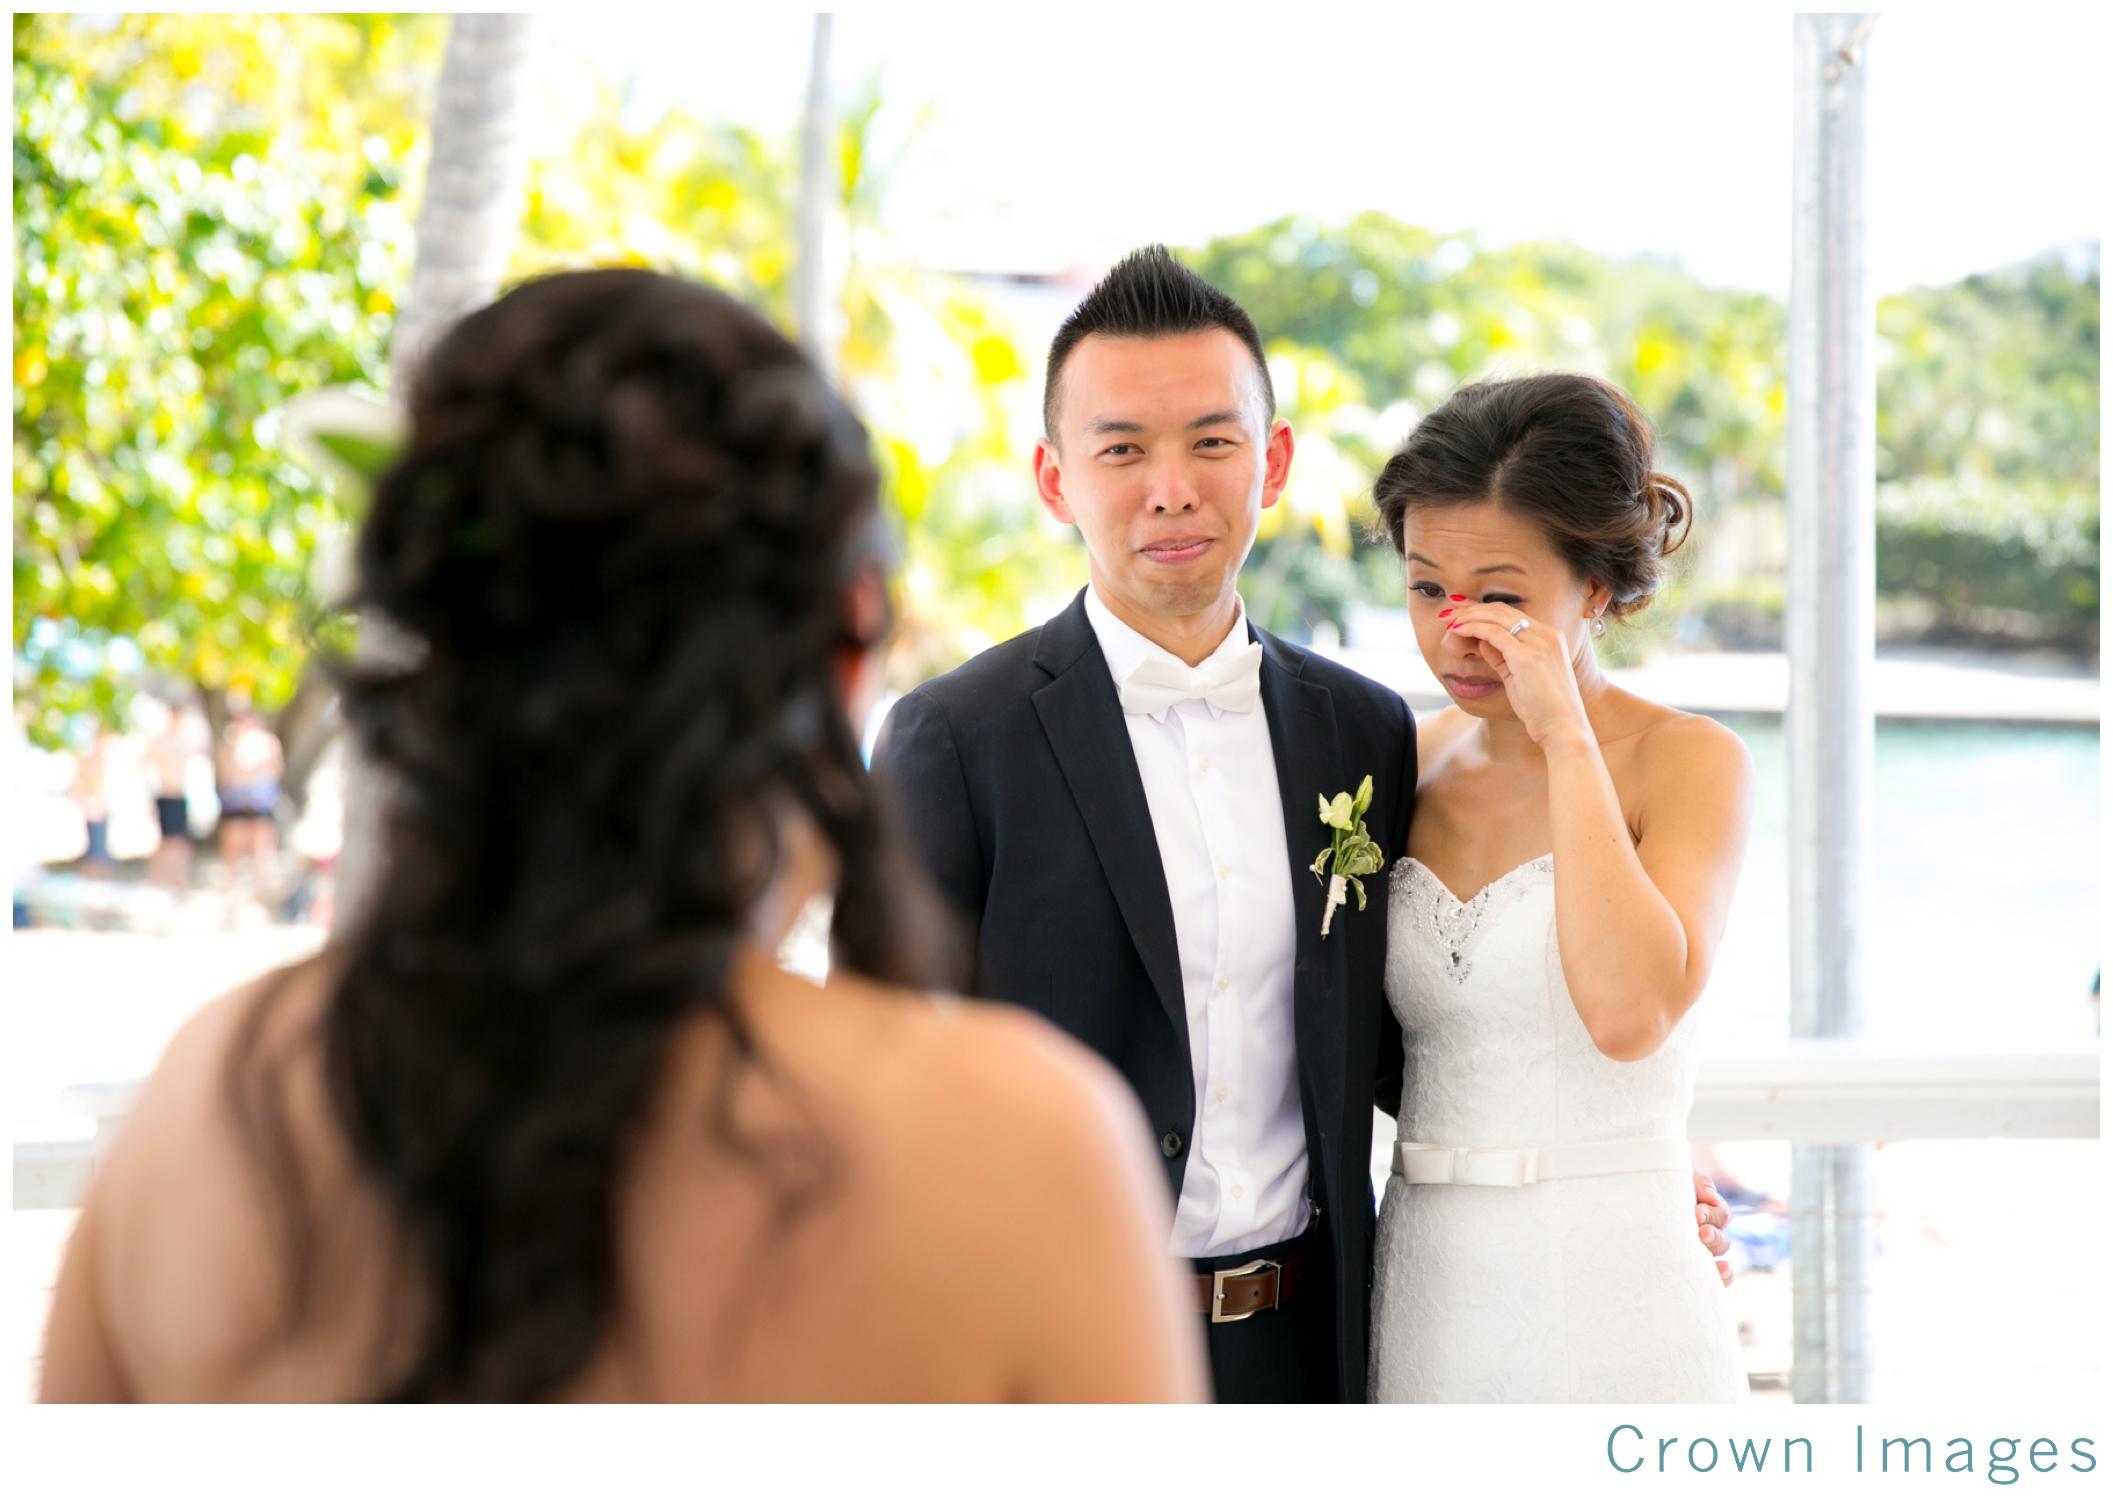 st_thomas_wedding_photographer_0811.jpg